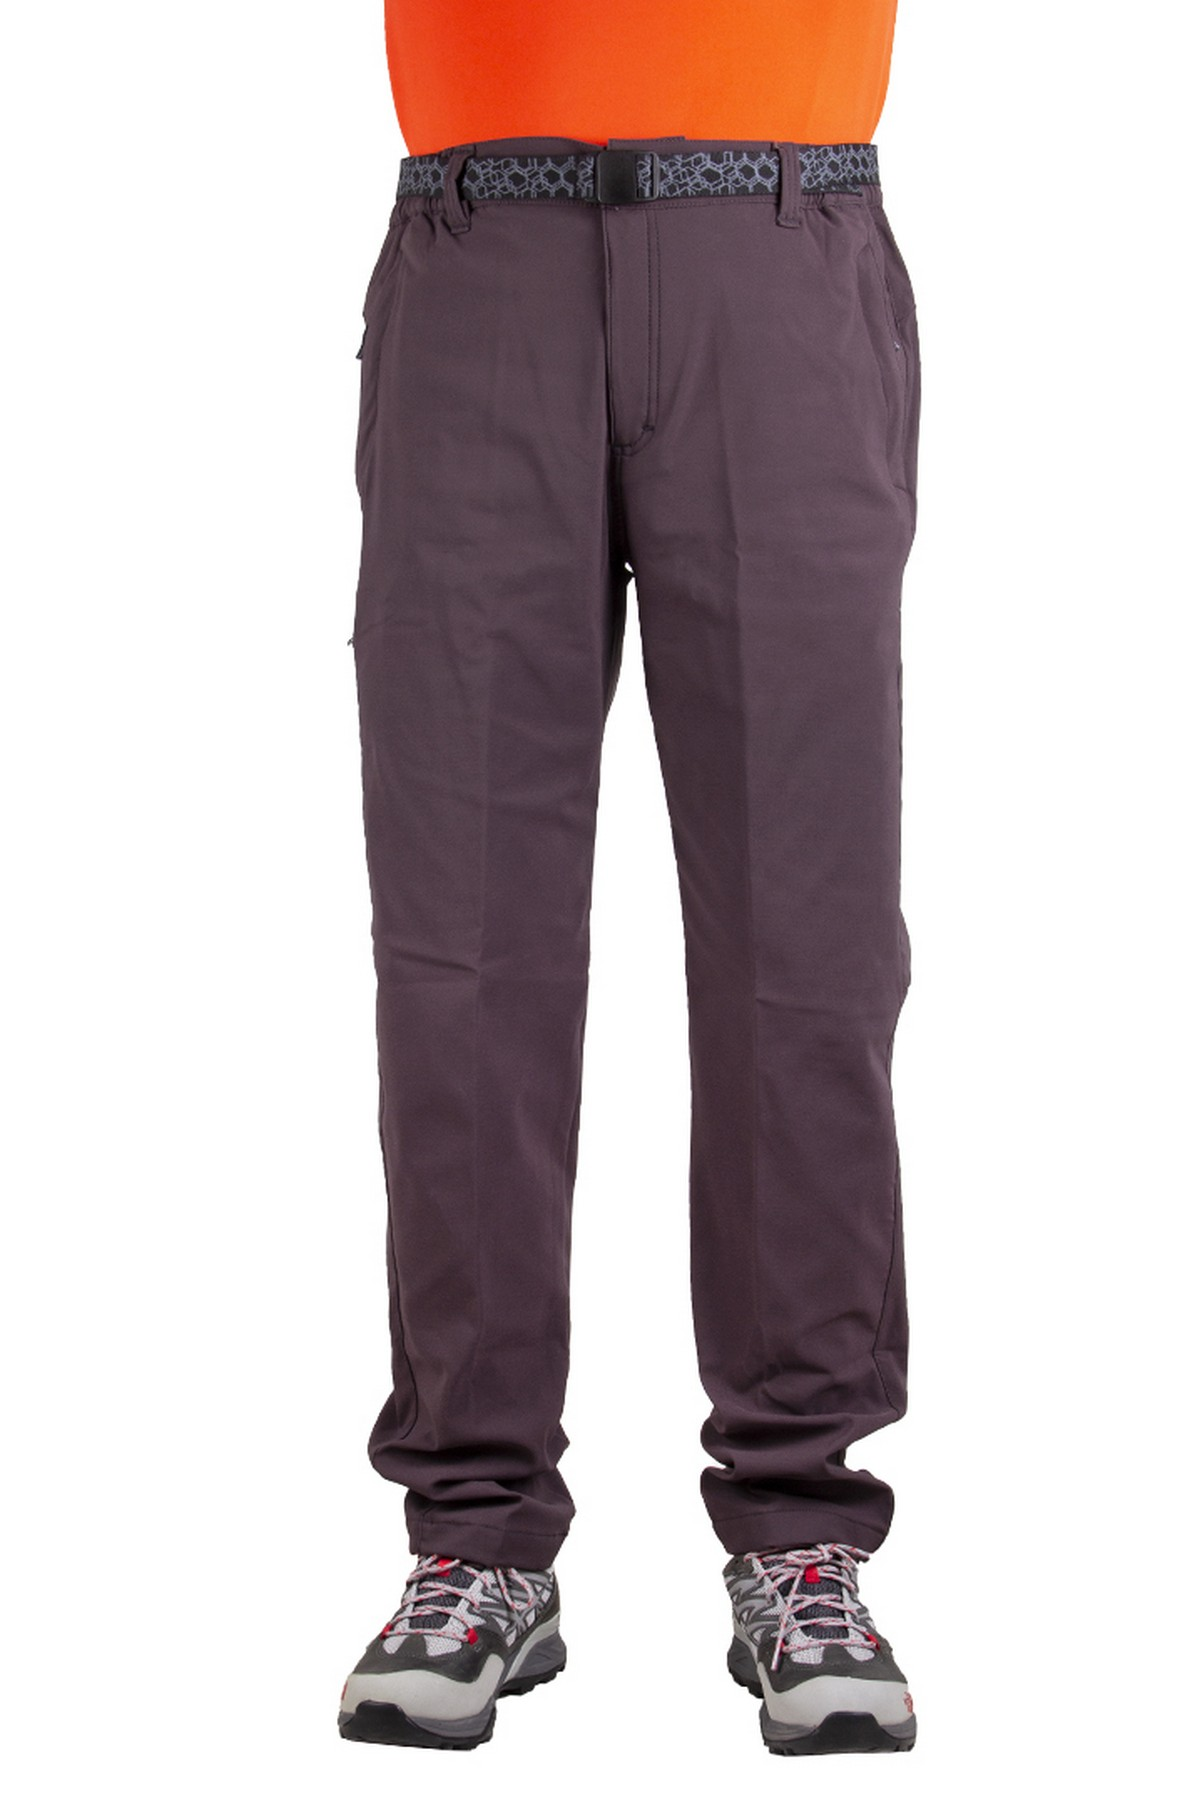 Free Camp Haute Trekking Antrasit Pantolon (105140-GR)